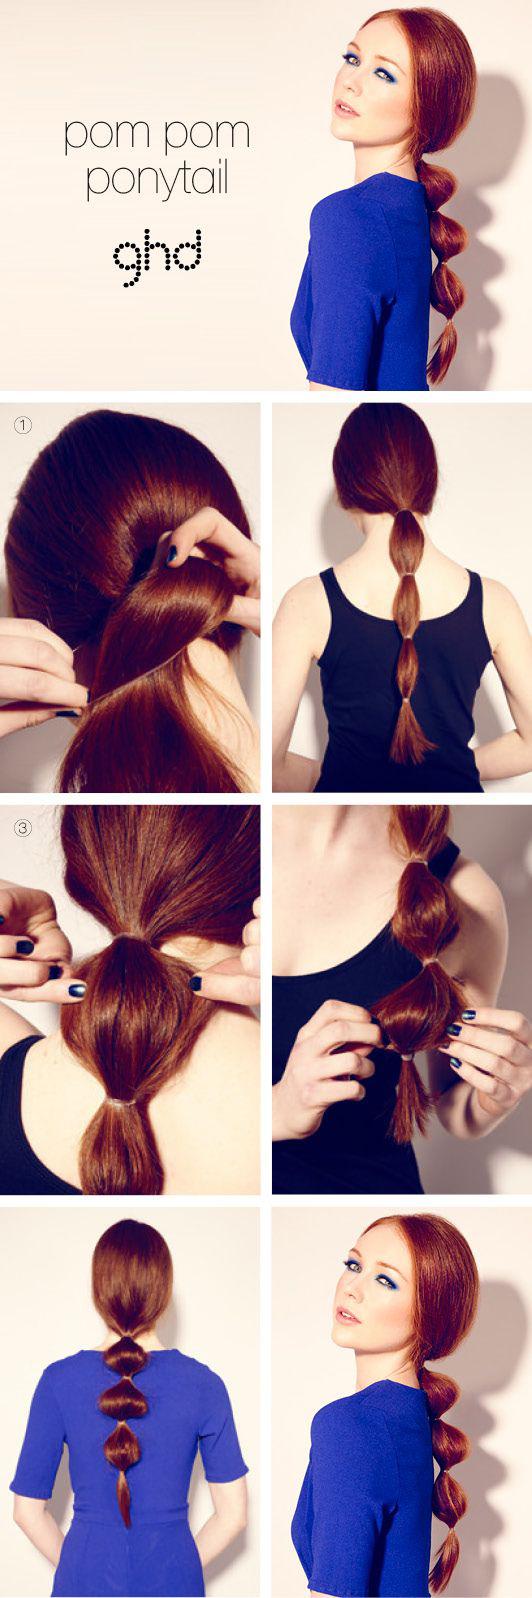 princesa hairstyle4